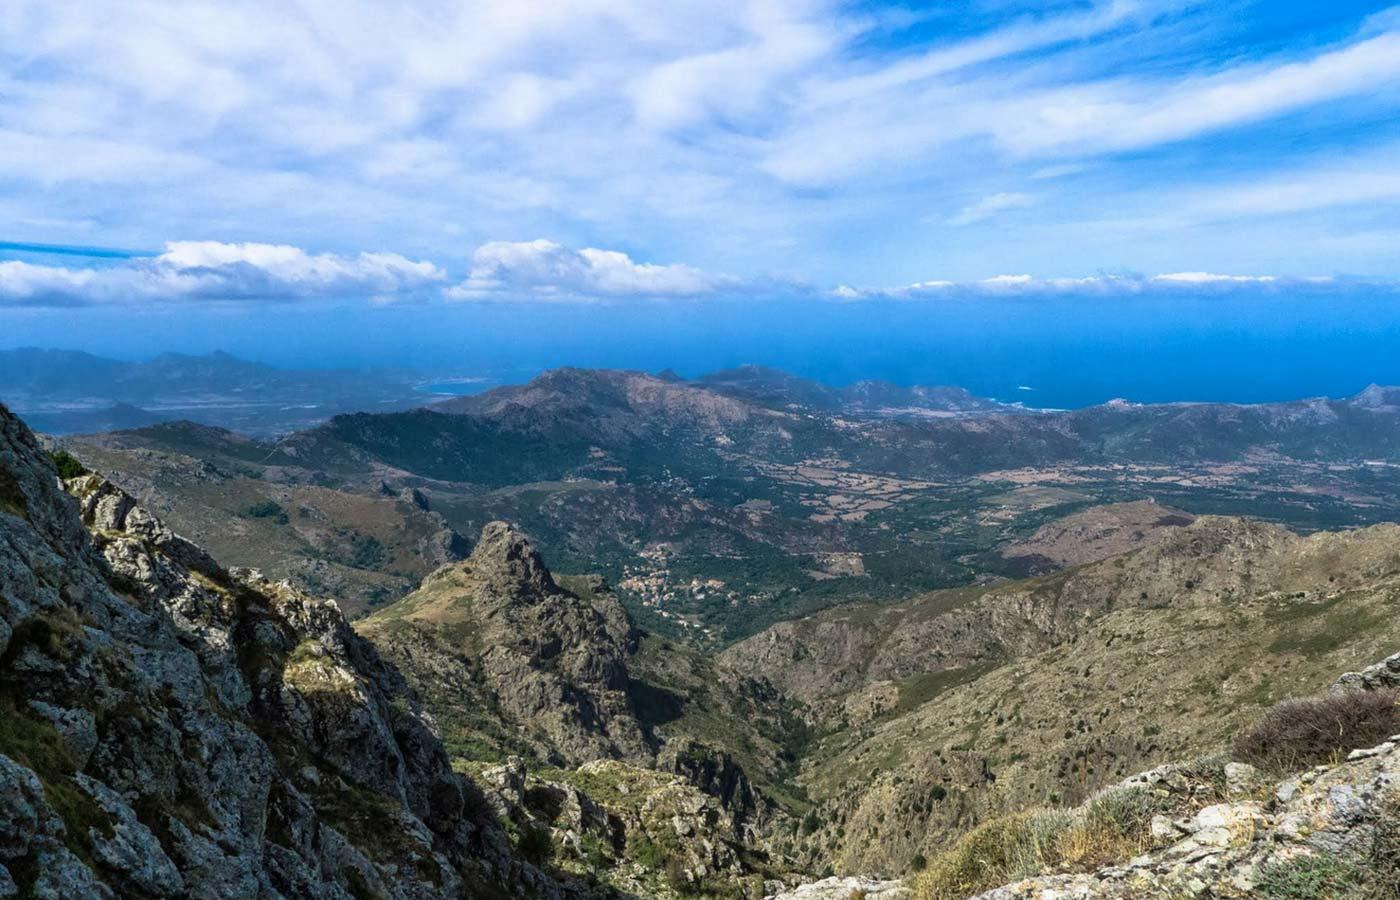 Authentic road trip in Corsica - Givi Explorer